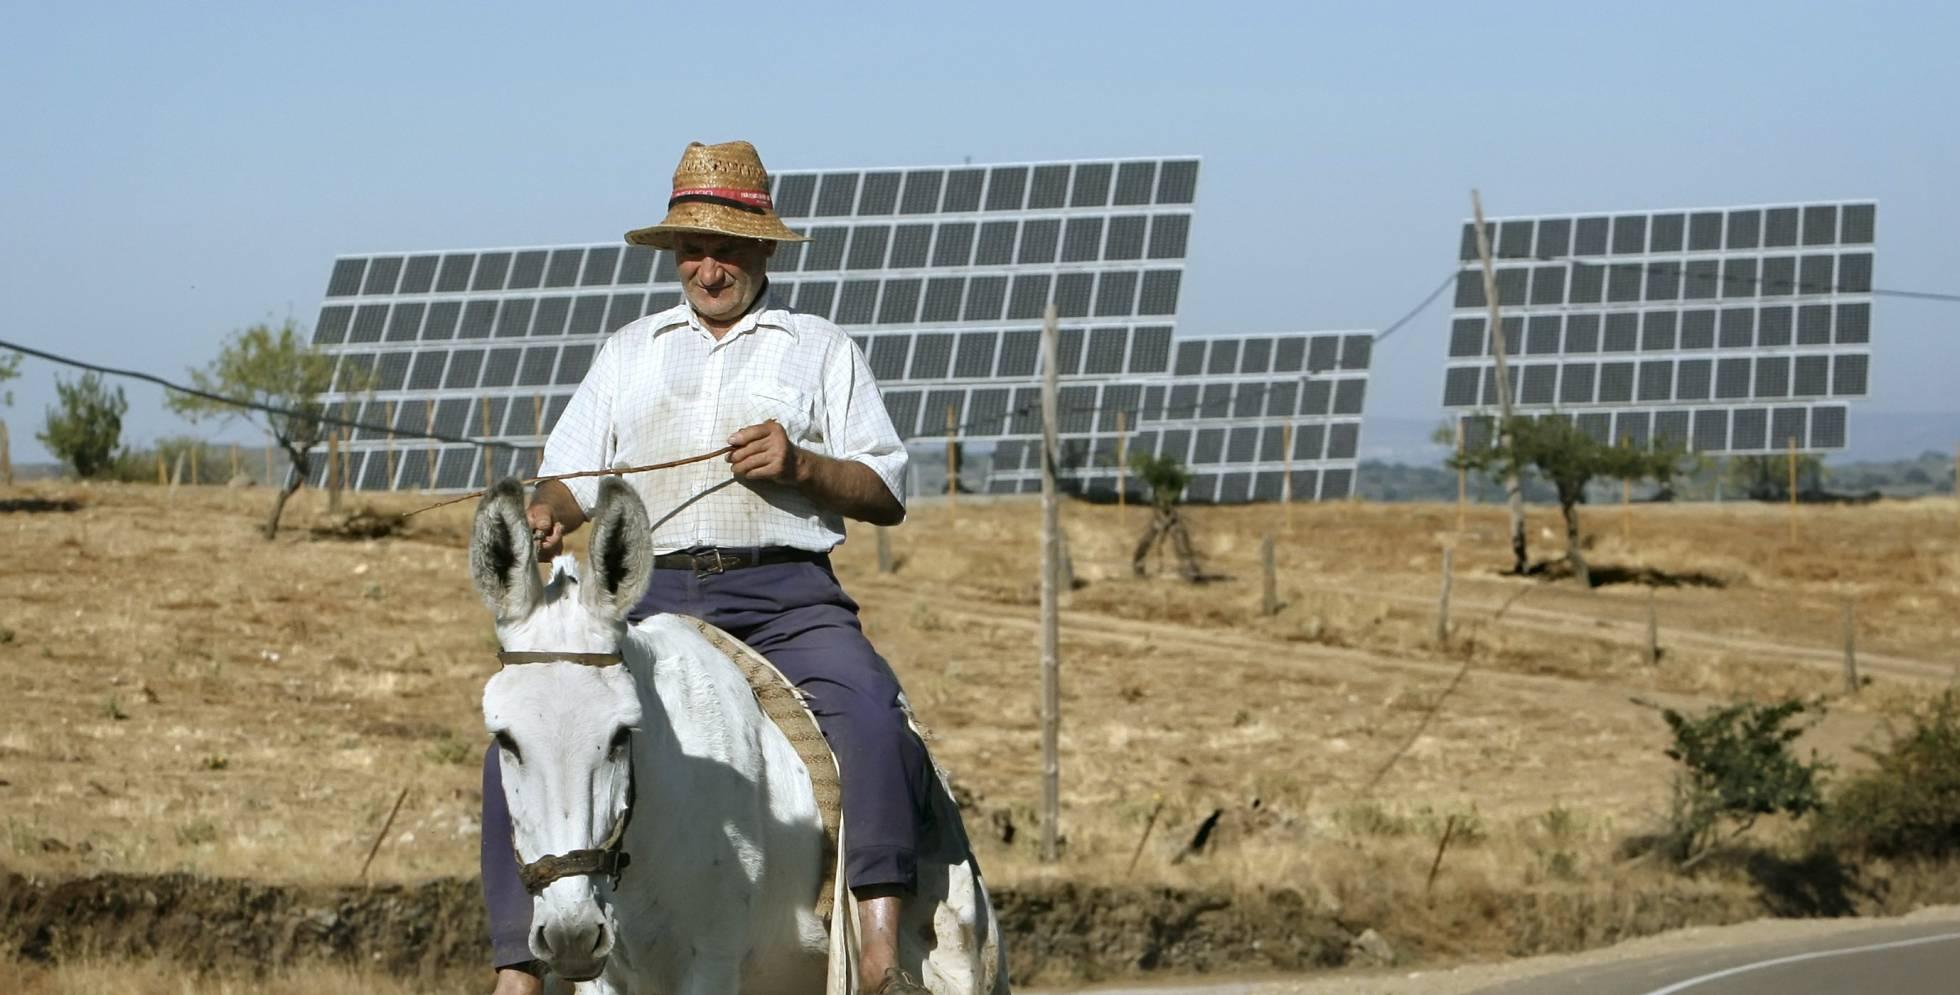 El Supremo da alas a 20.000 titulares de huertos solares para demandar a la banca